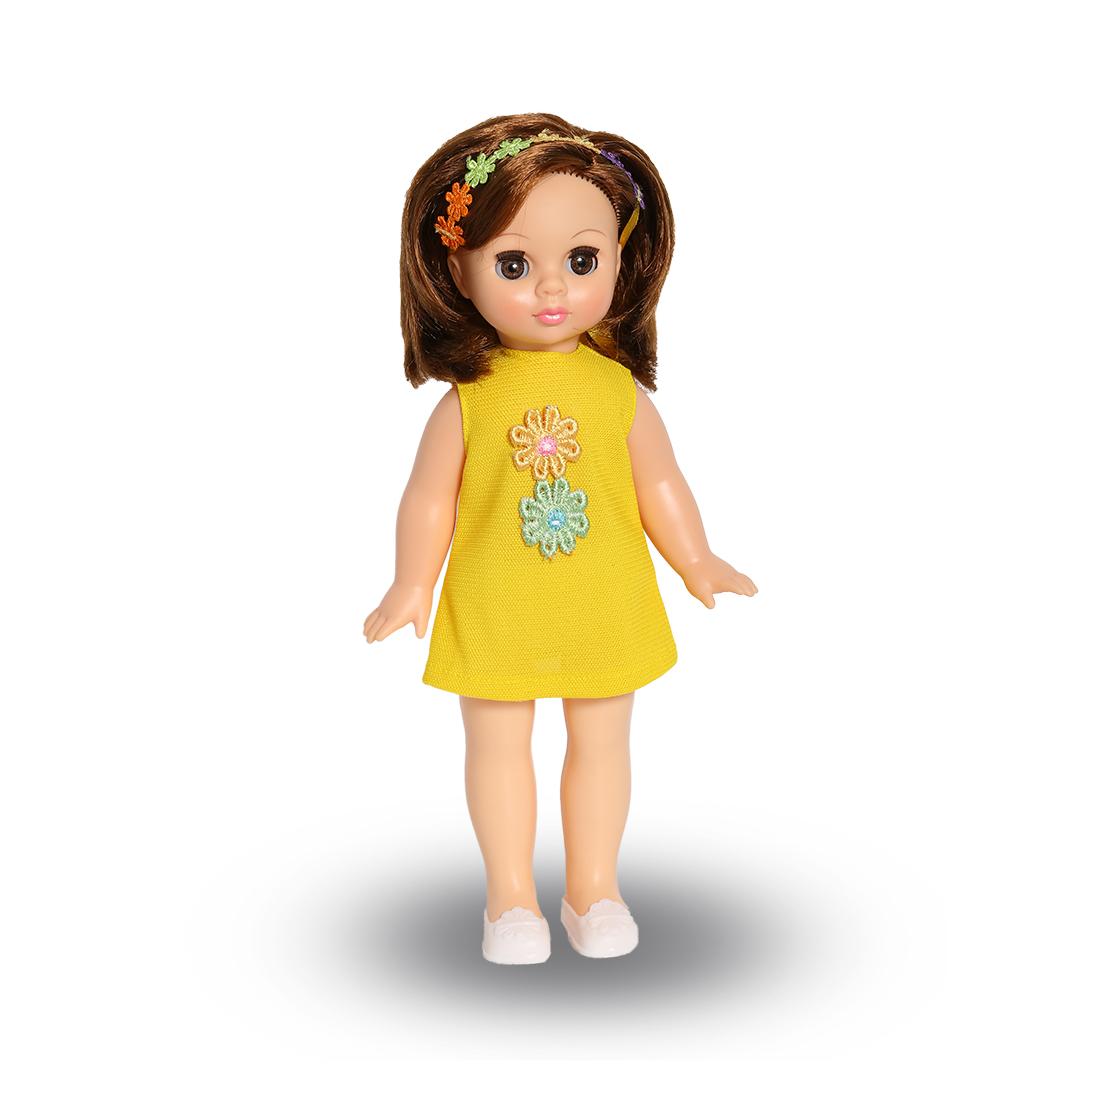 Кукла – Эля 20, 30,5 смРусские куклы фабрики Весна<br>Кукла – Эля 20, 30,5 см<br>